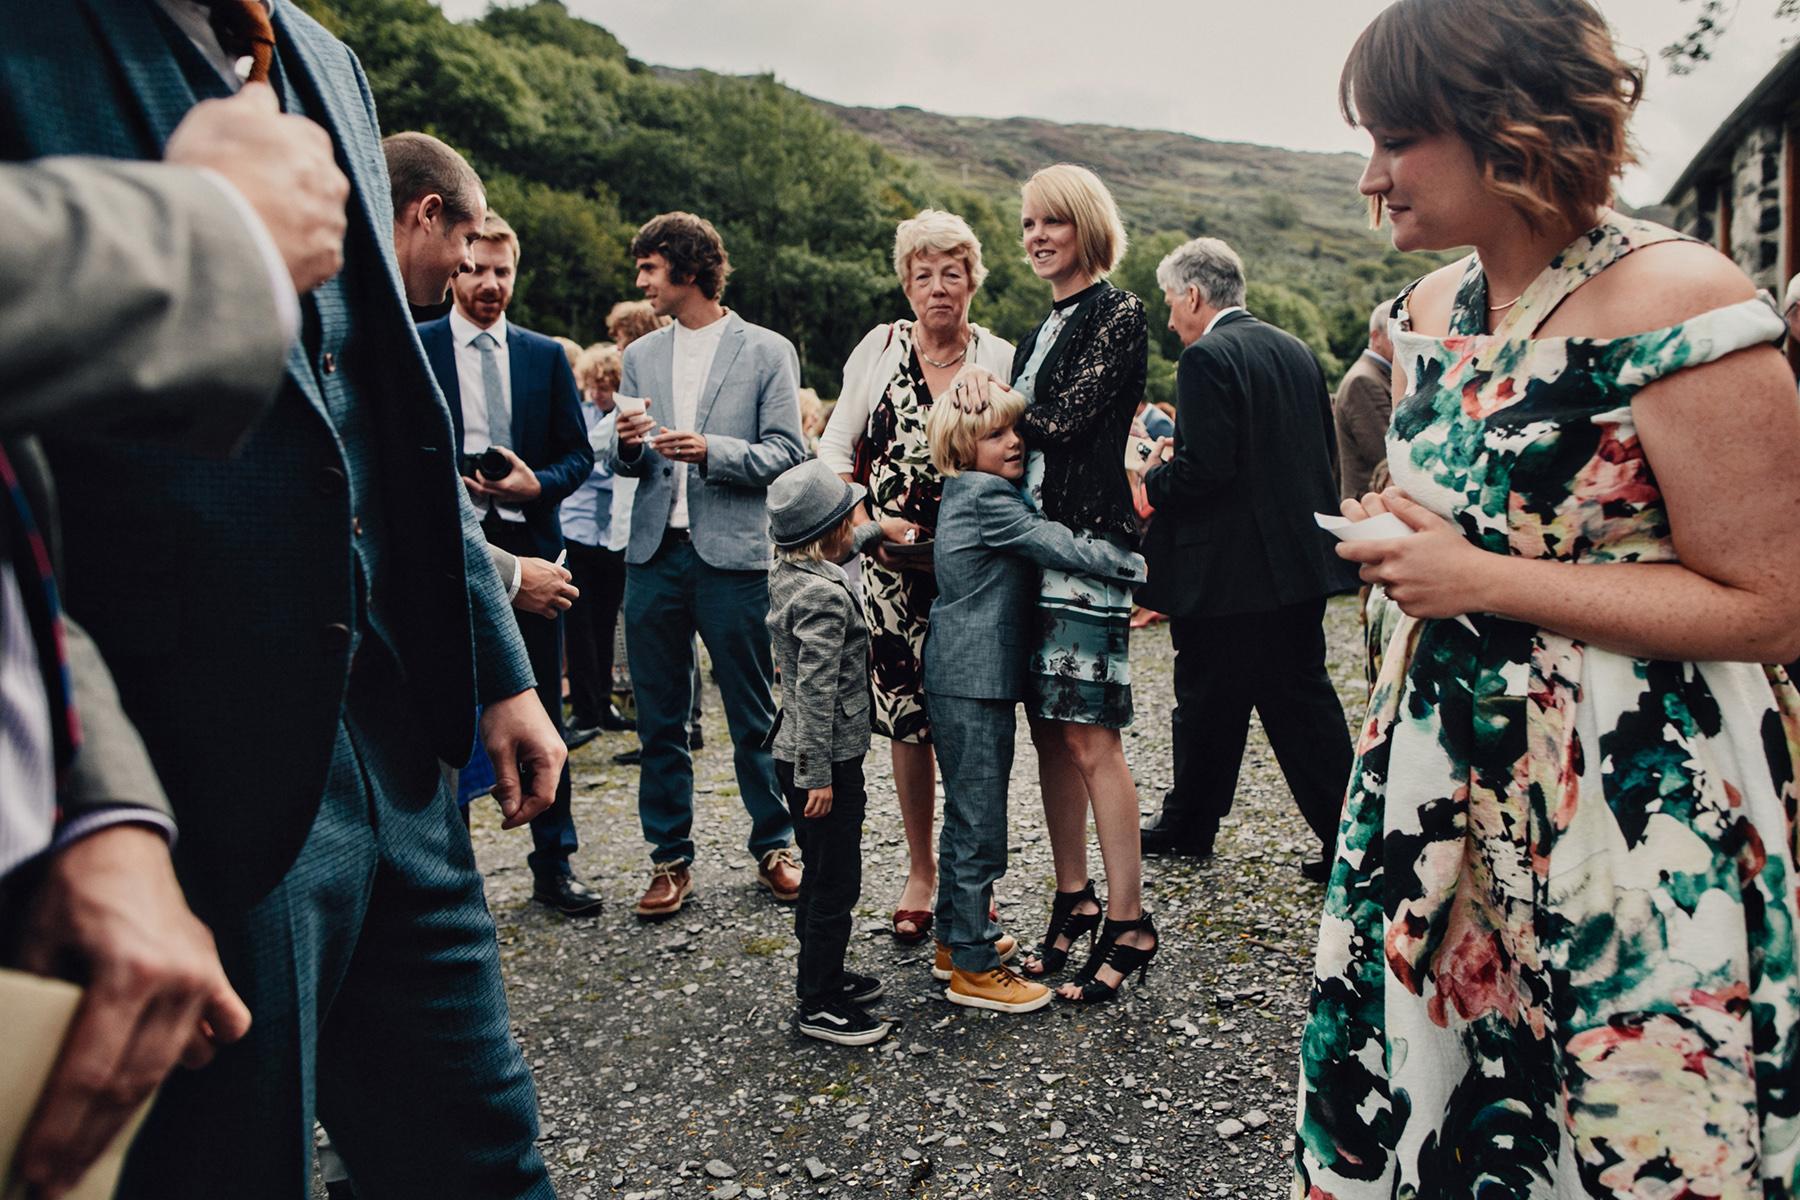 Snowdonia-Wales-Wedding-Photos-0343.jpg